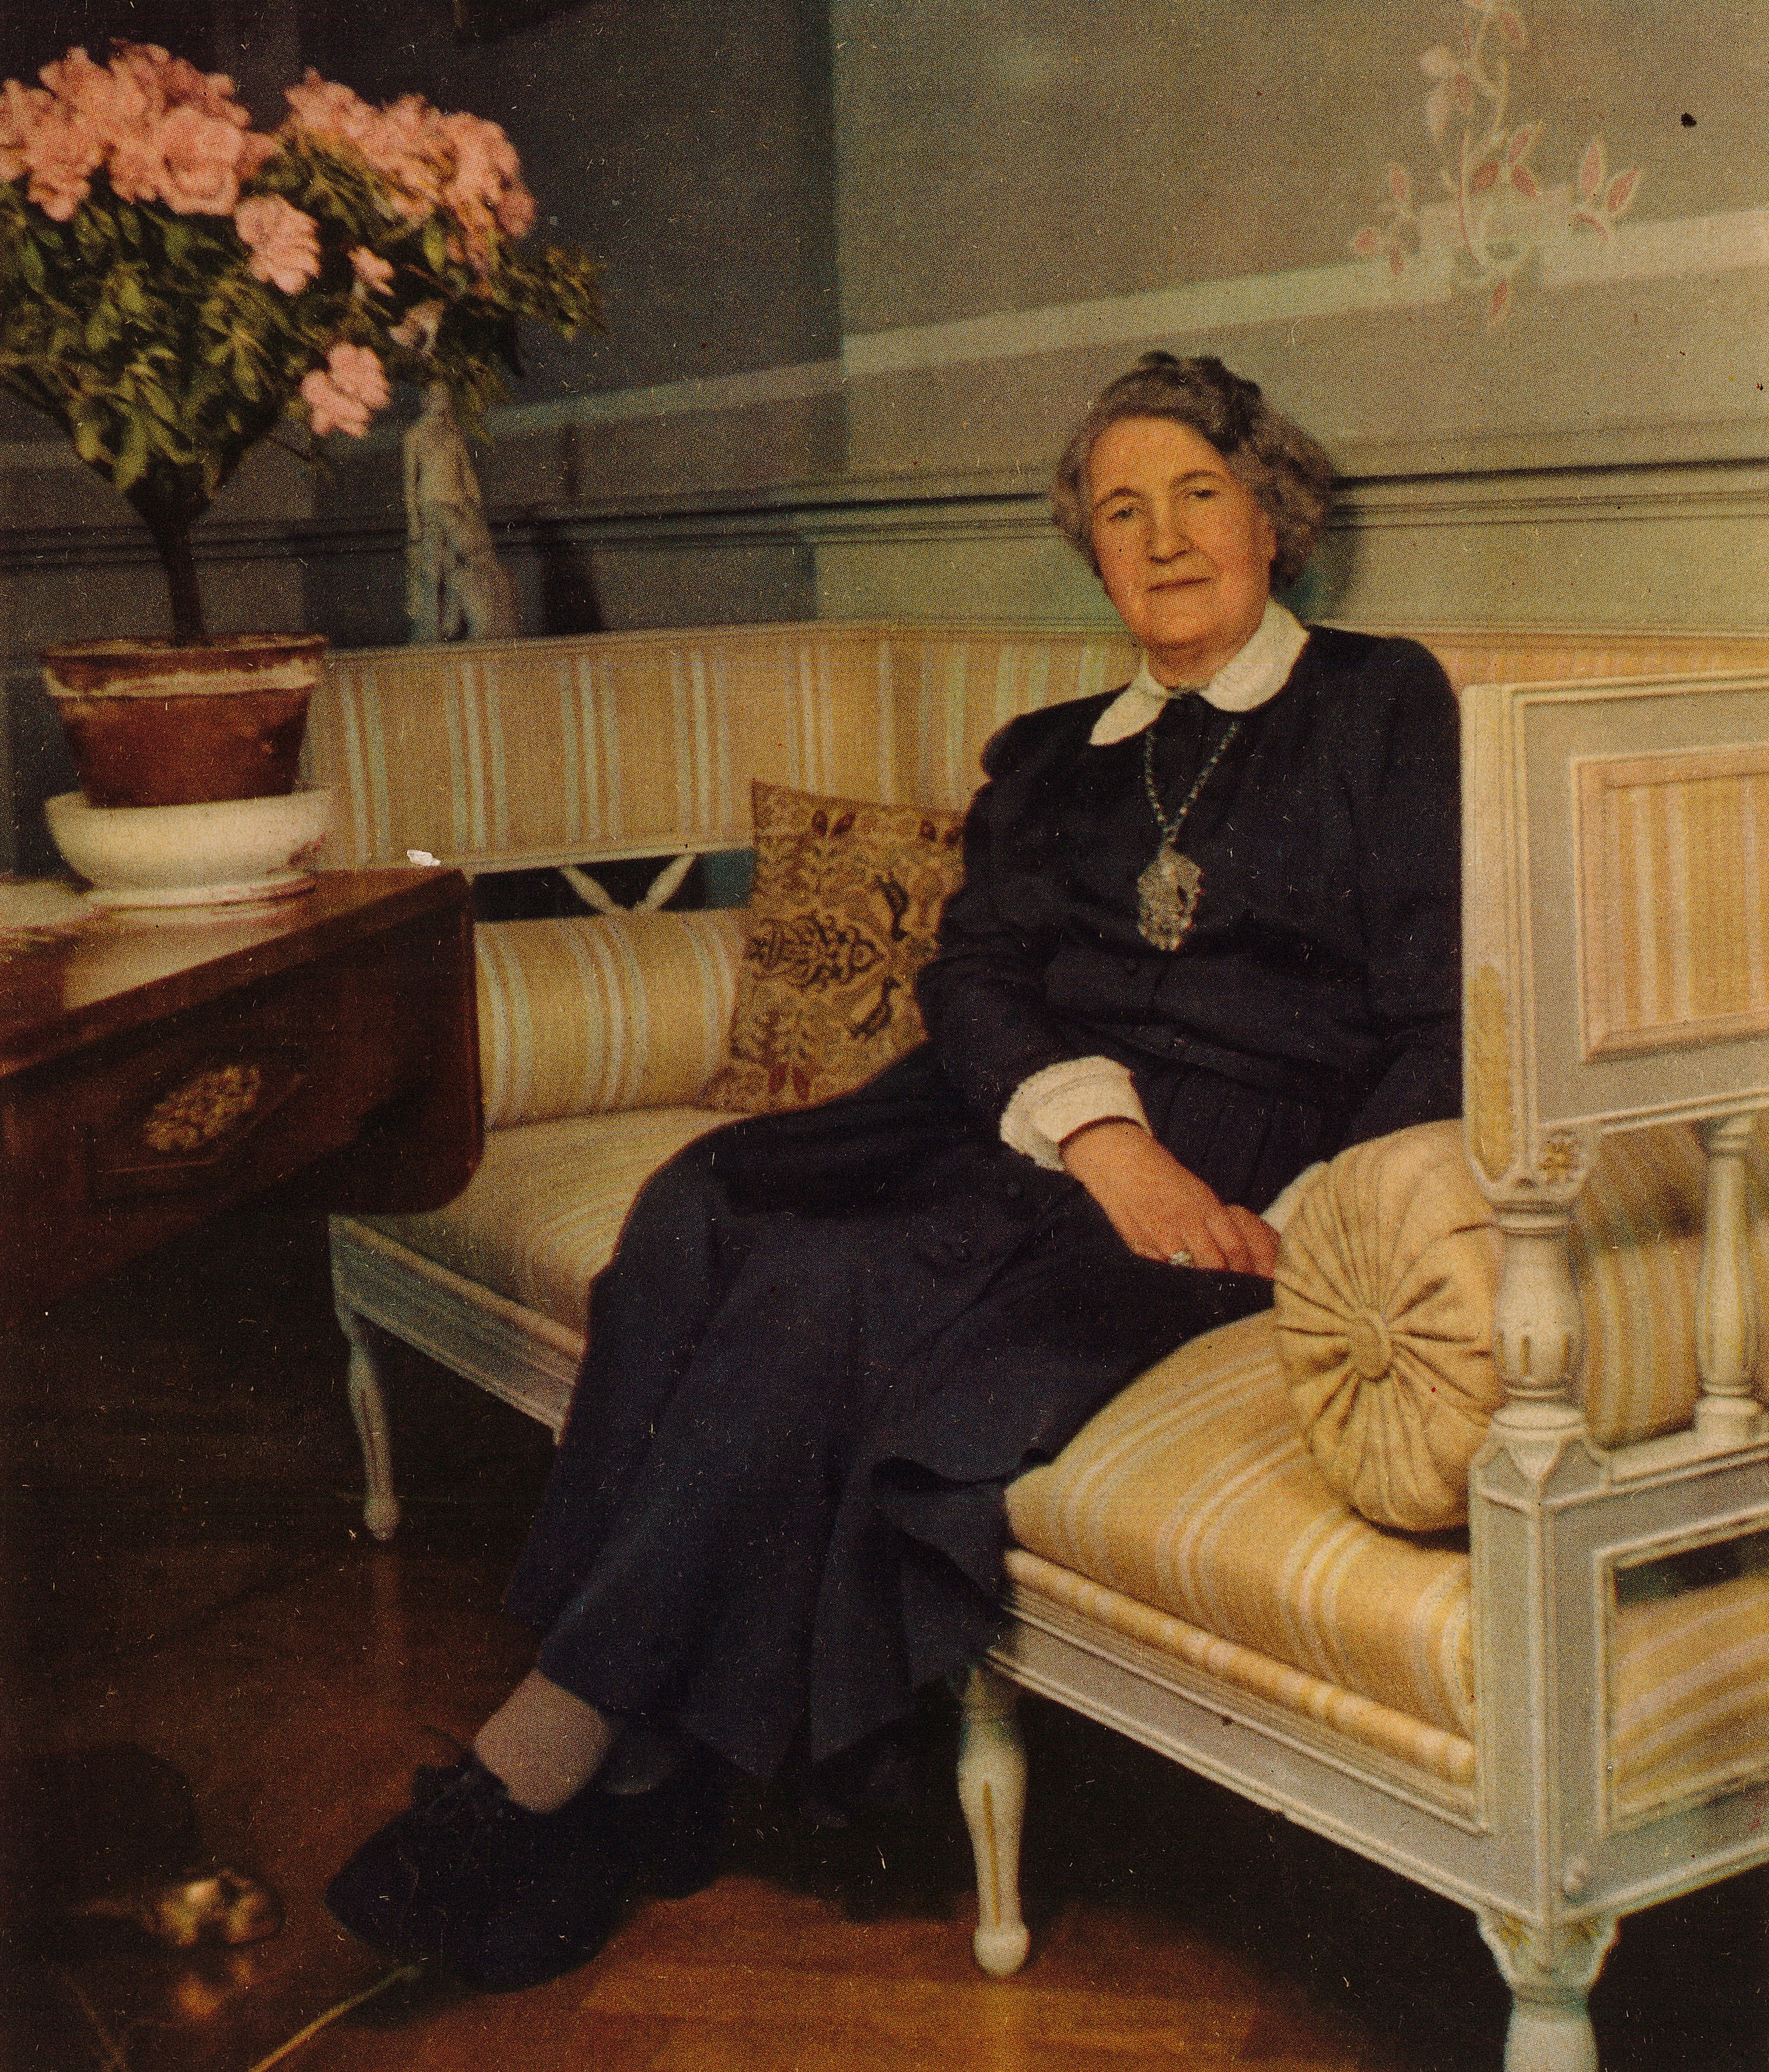 Maja Sandler on the cover of Husmodern nr 17, 1949. Photographer unknown (KvinnSam, Göteborg universitetsbibliotek)